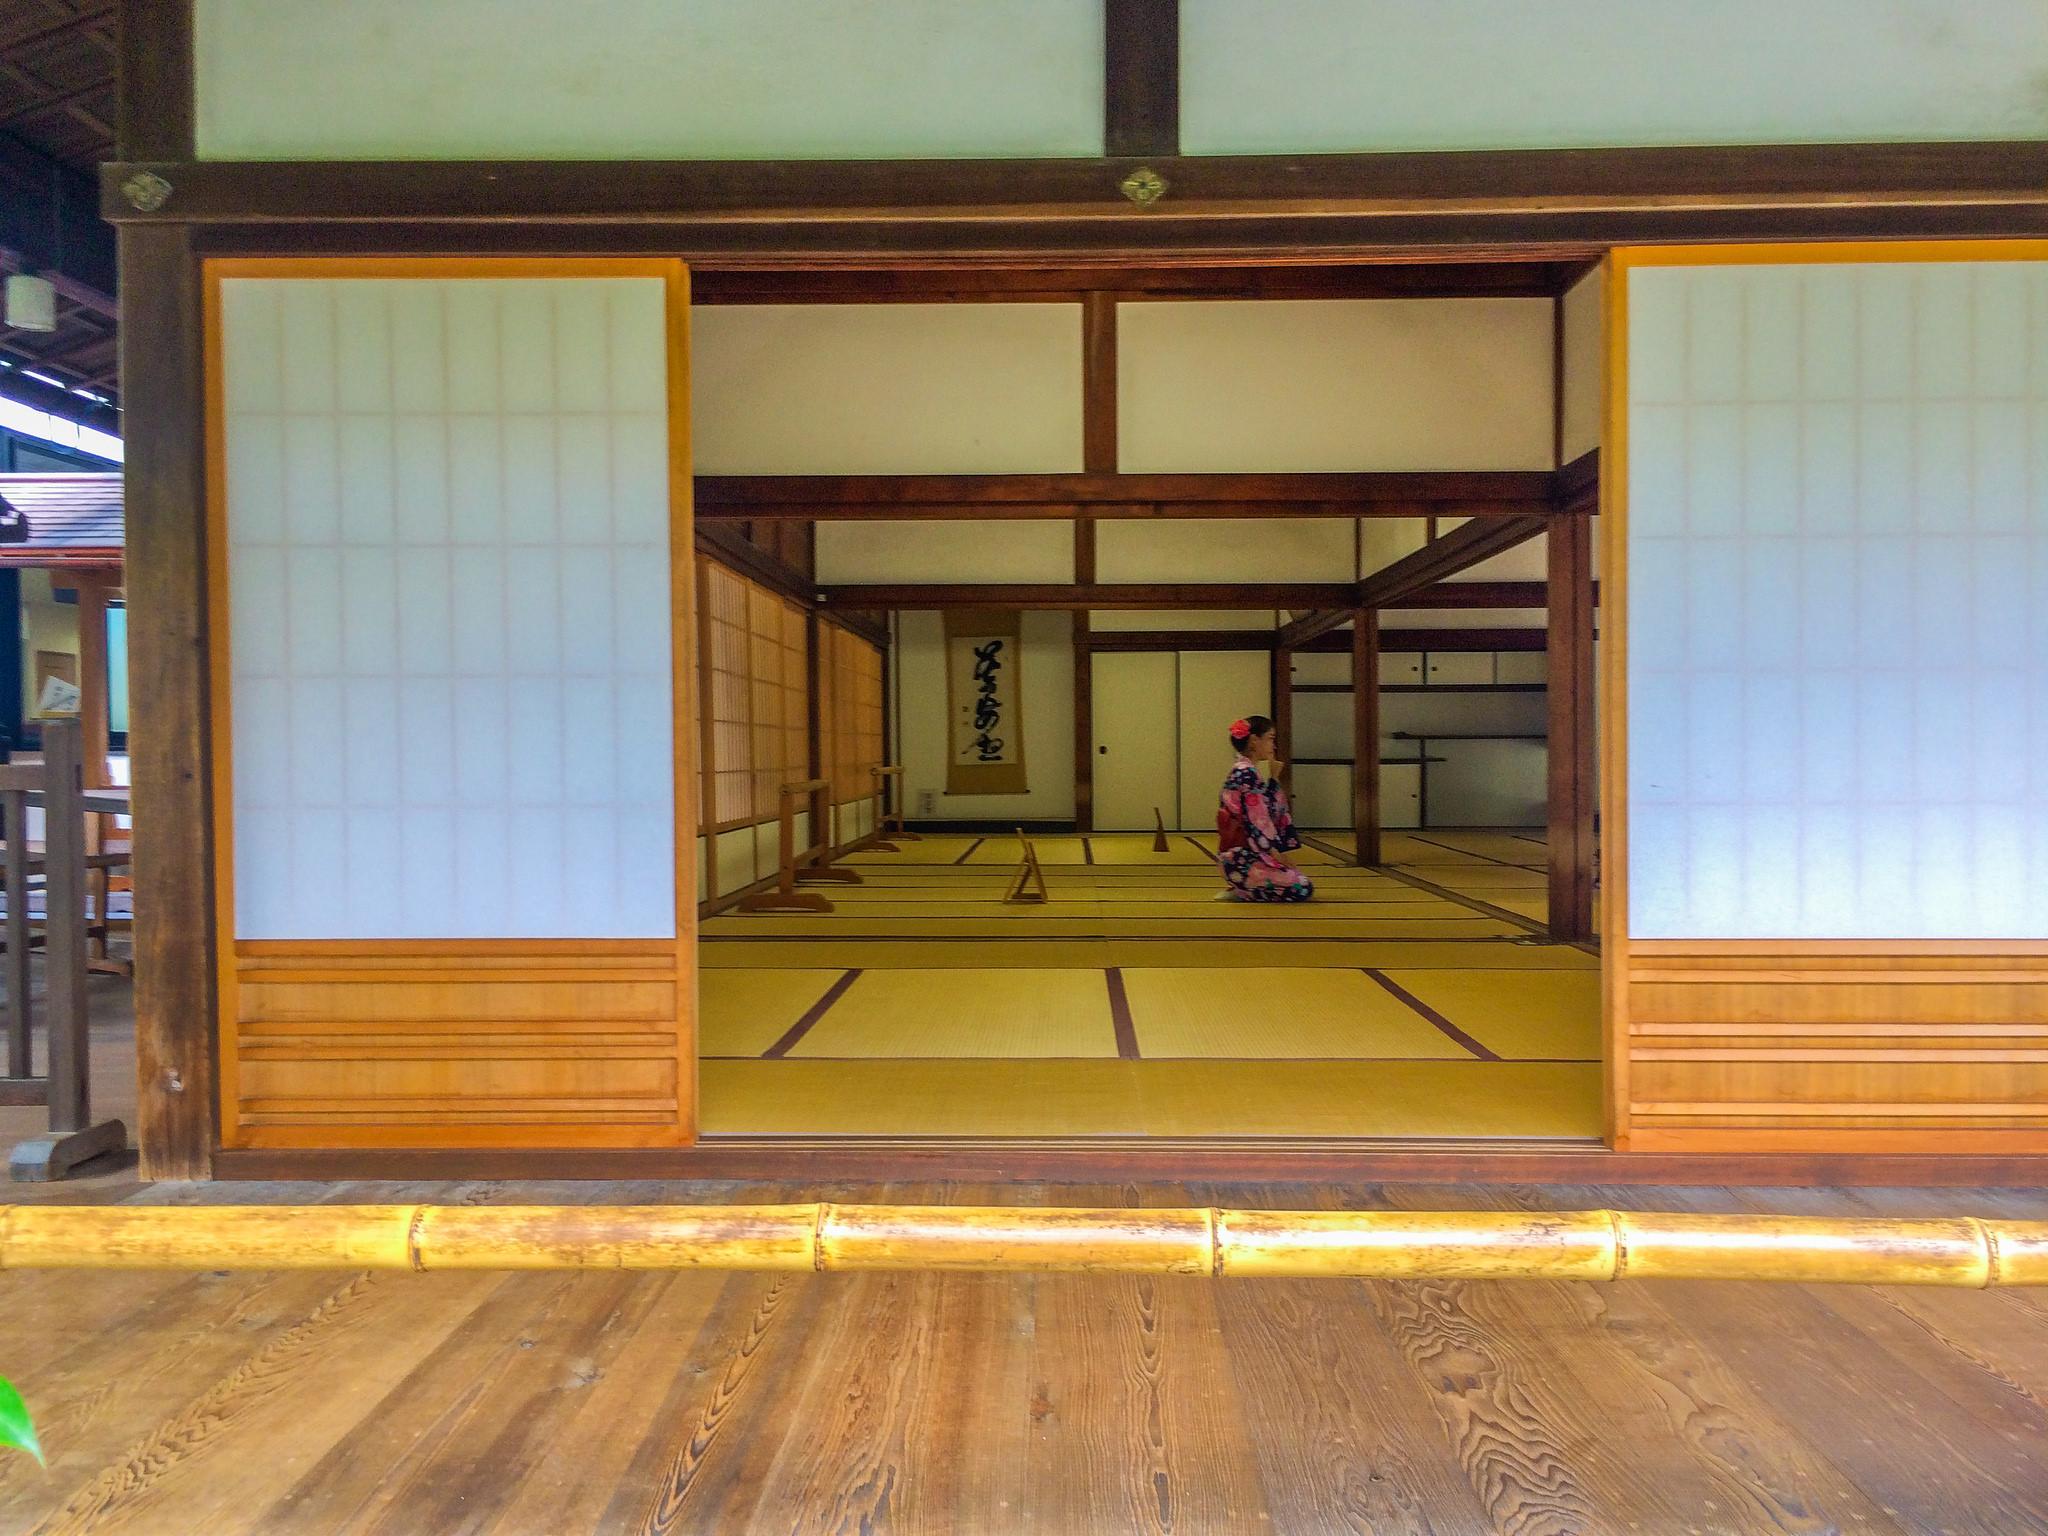 29730017063_d9e0acd8c5_k.jpgA Guide to Finding your Zen in the Peaceful and Serene Gardens of Tenryu-ji Temple Arashiyama